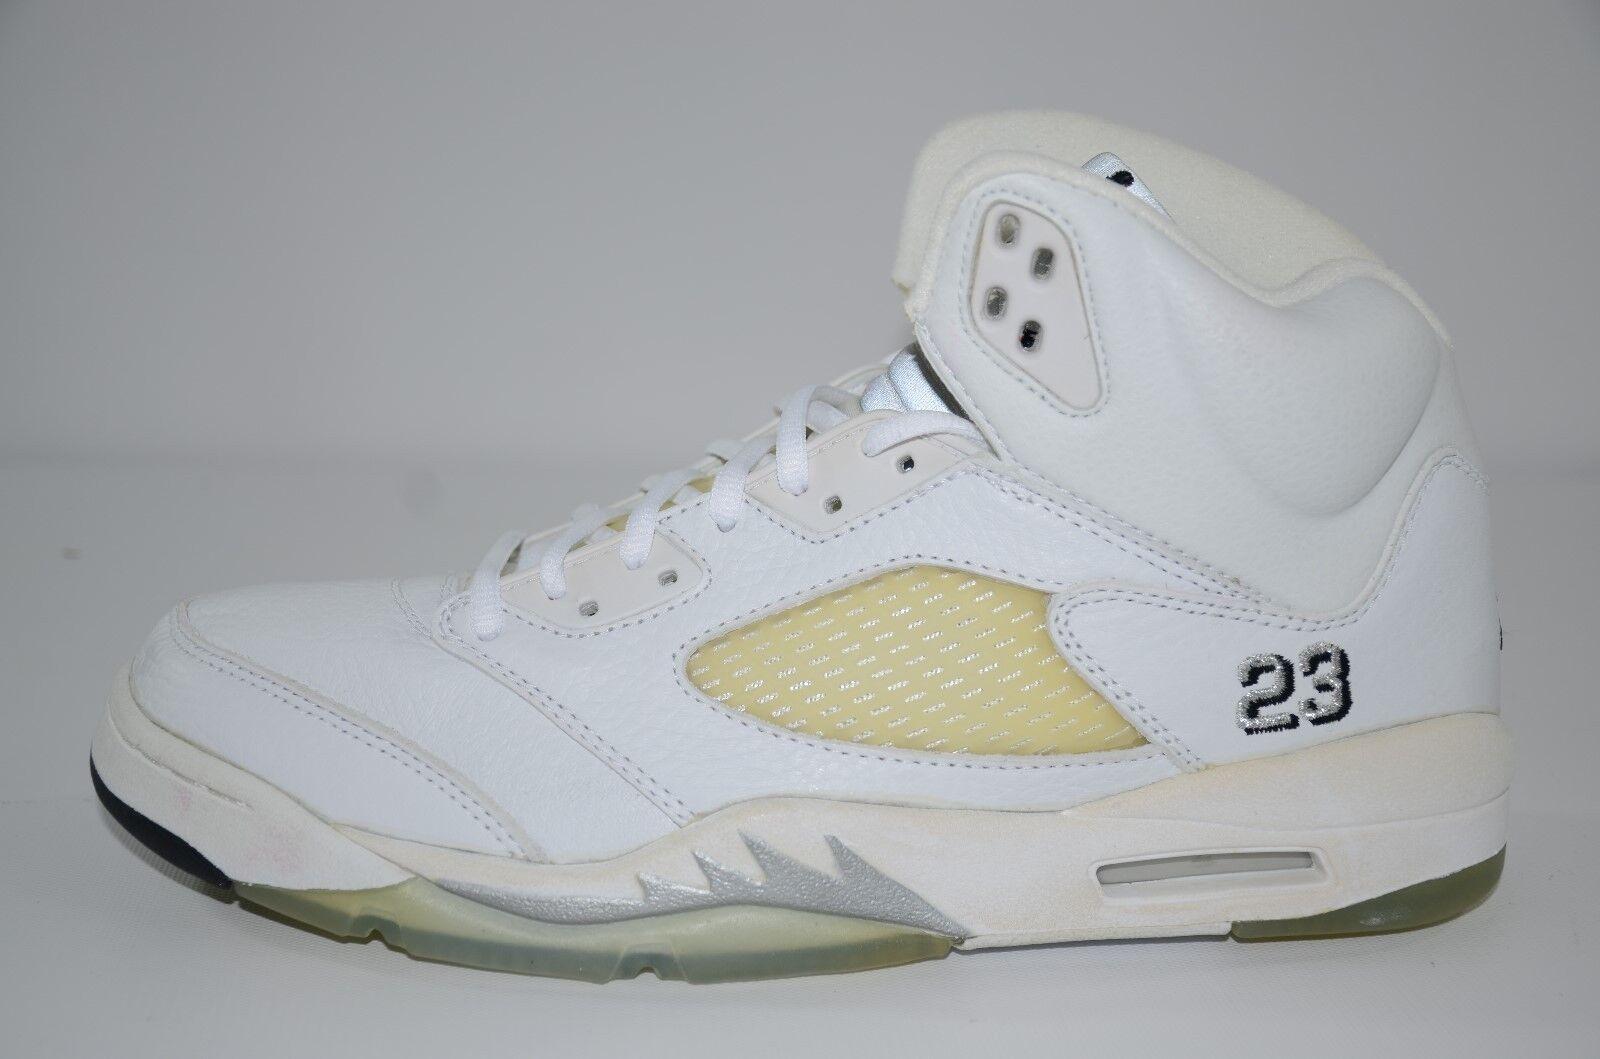 Nike Air Jordan 5 Retro Metallic White 2000 DS Size 10.5 136045-101 unwearable